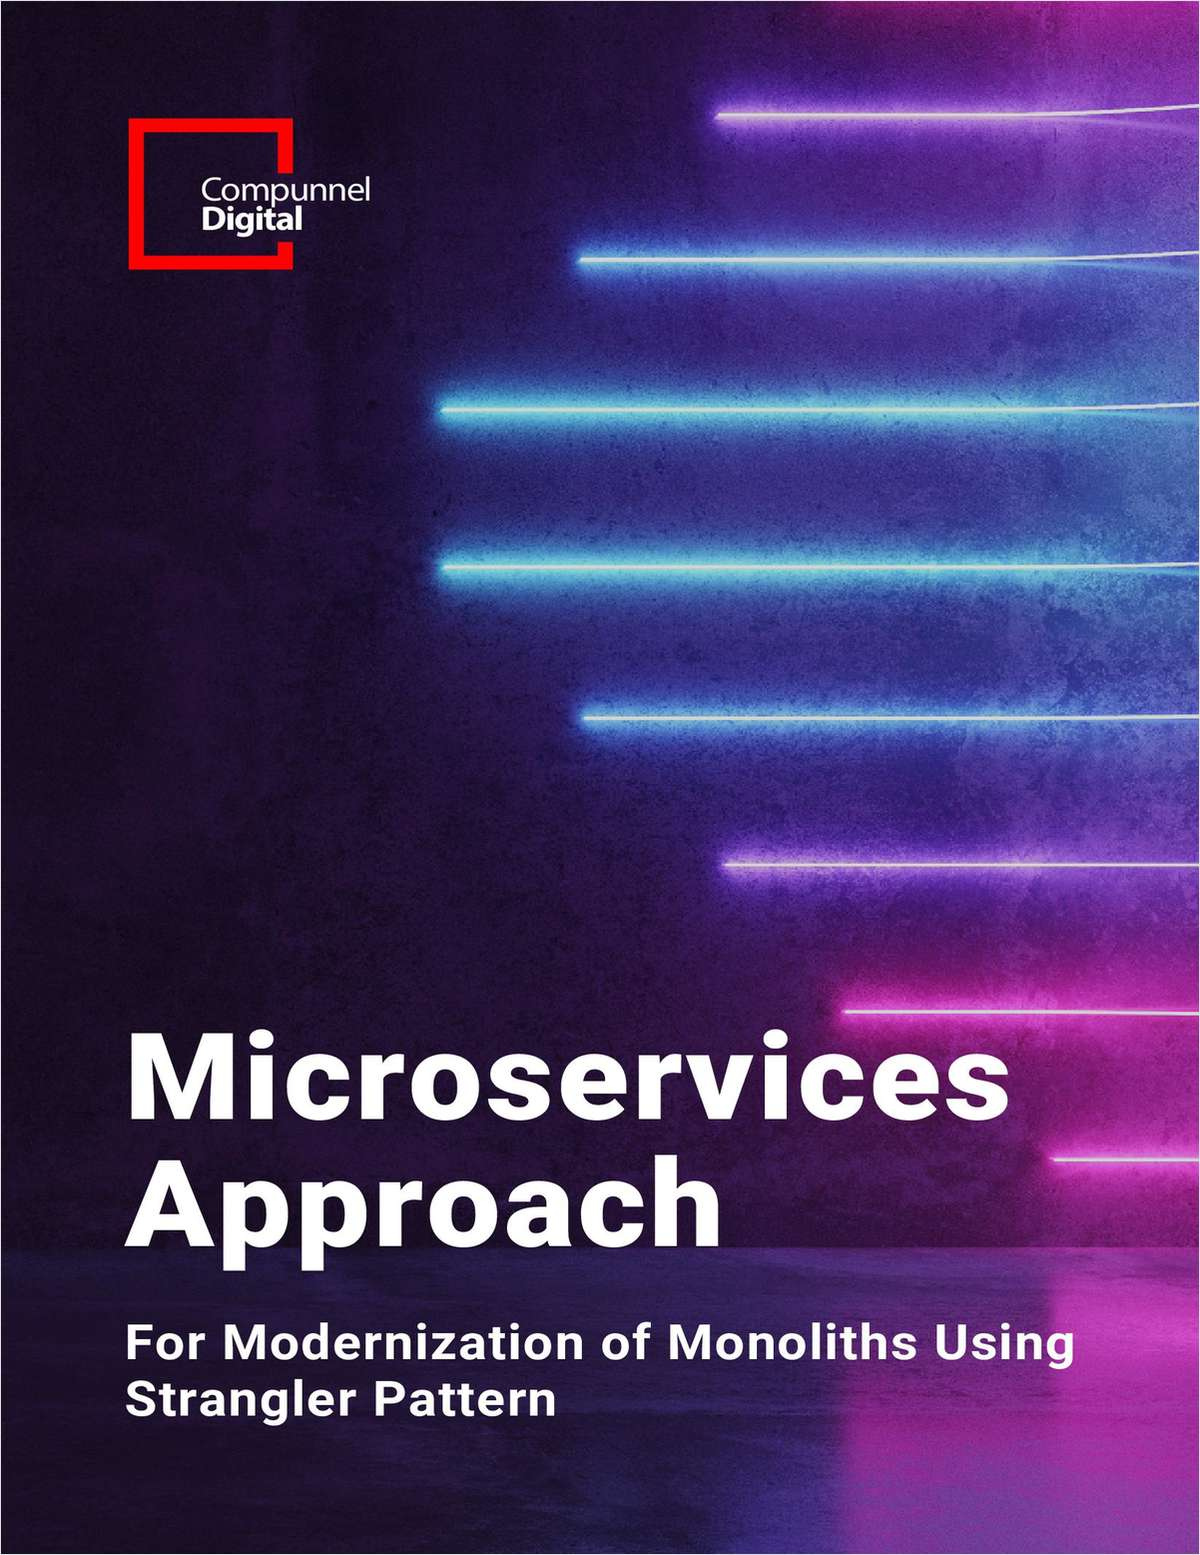 Microservices Approach For Modernization of Monoliths Using Strangler Pattern